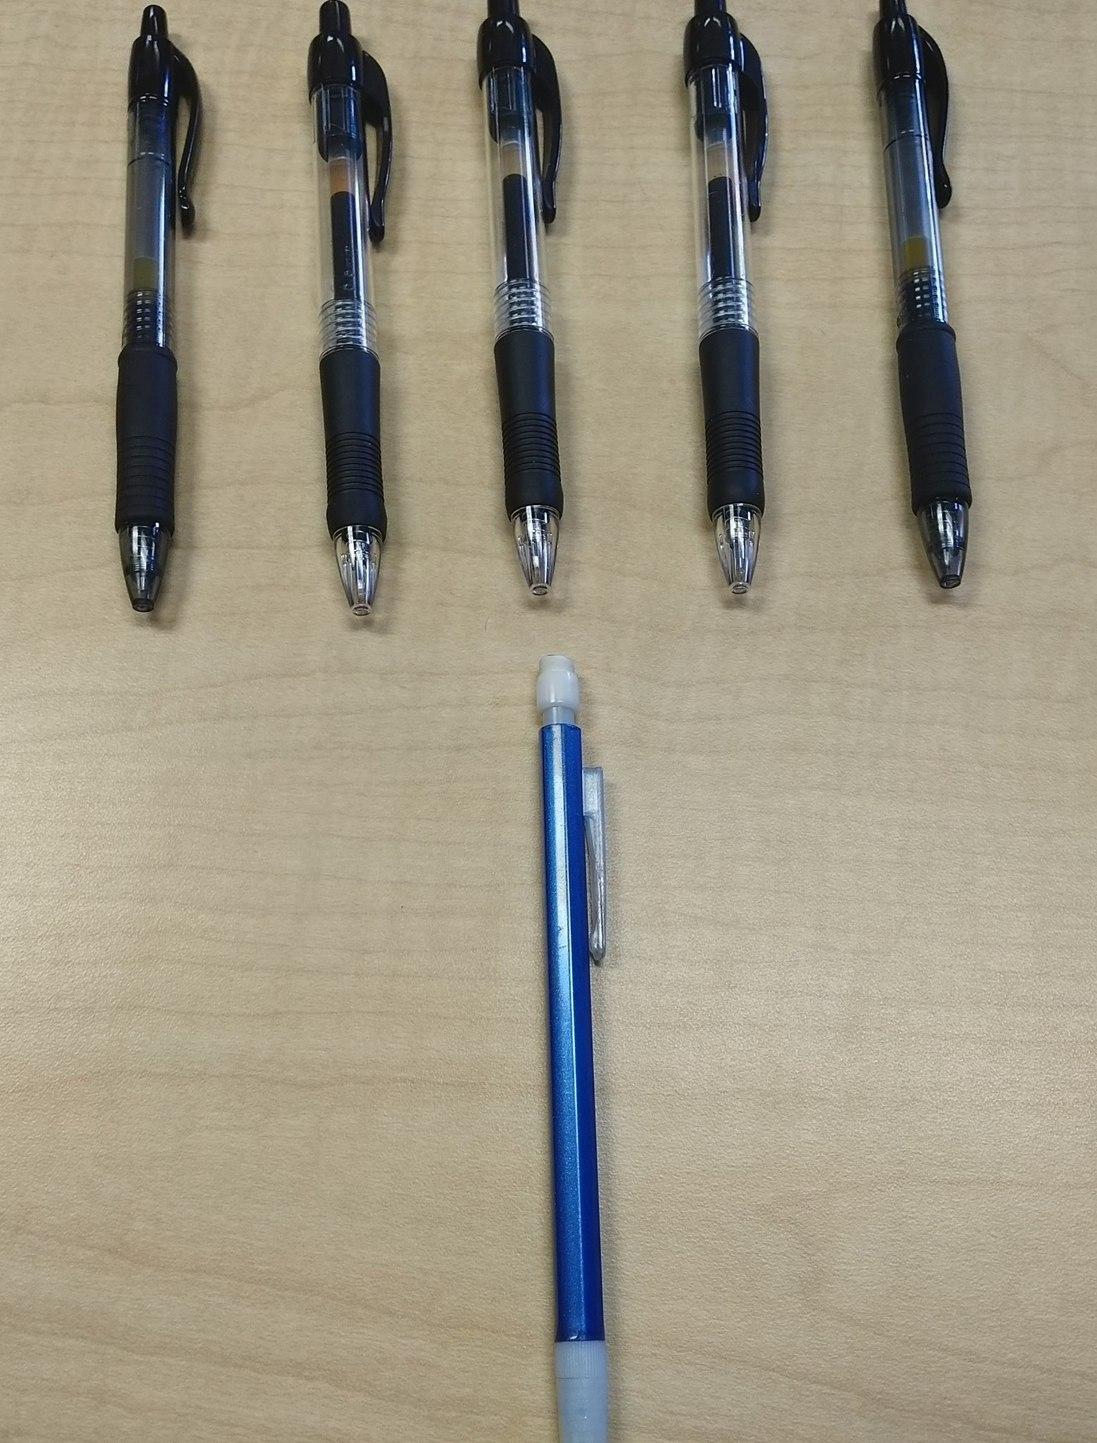 Five black pens - meme